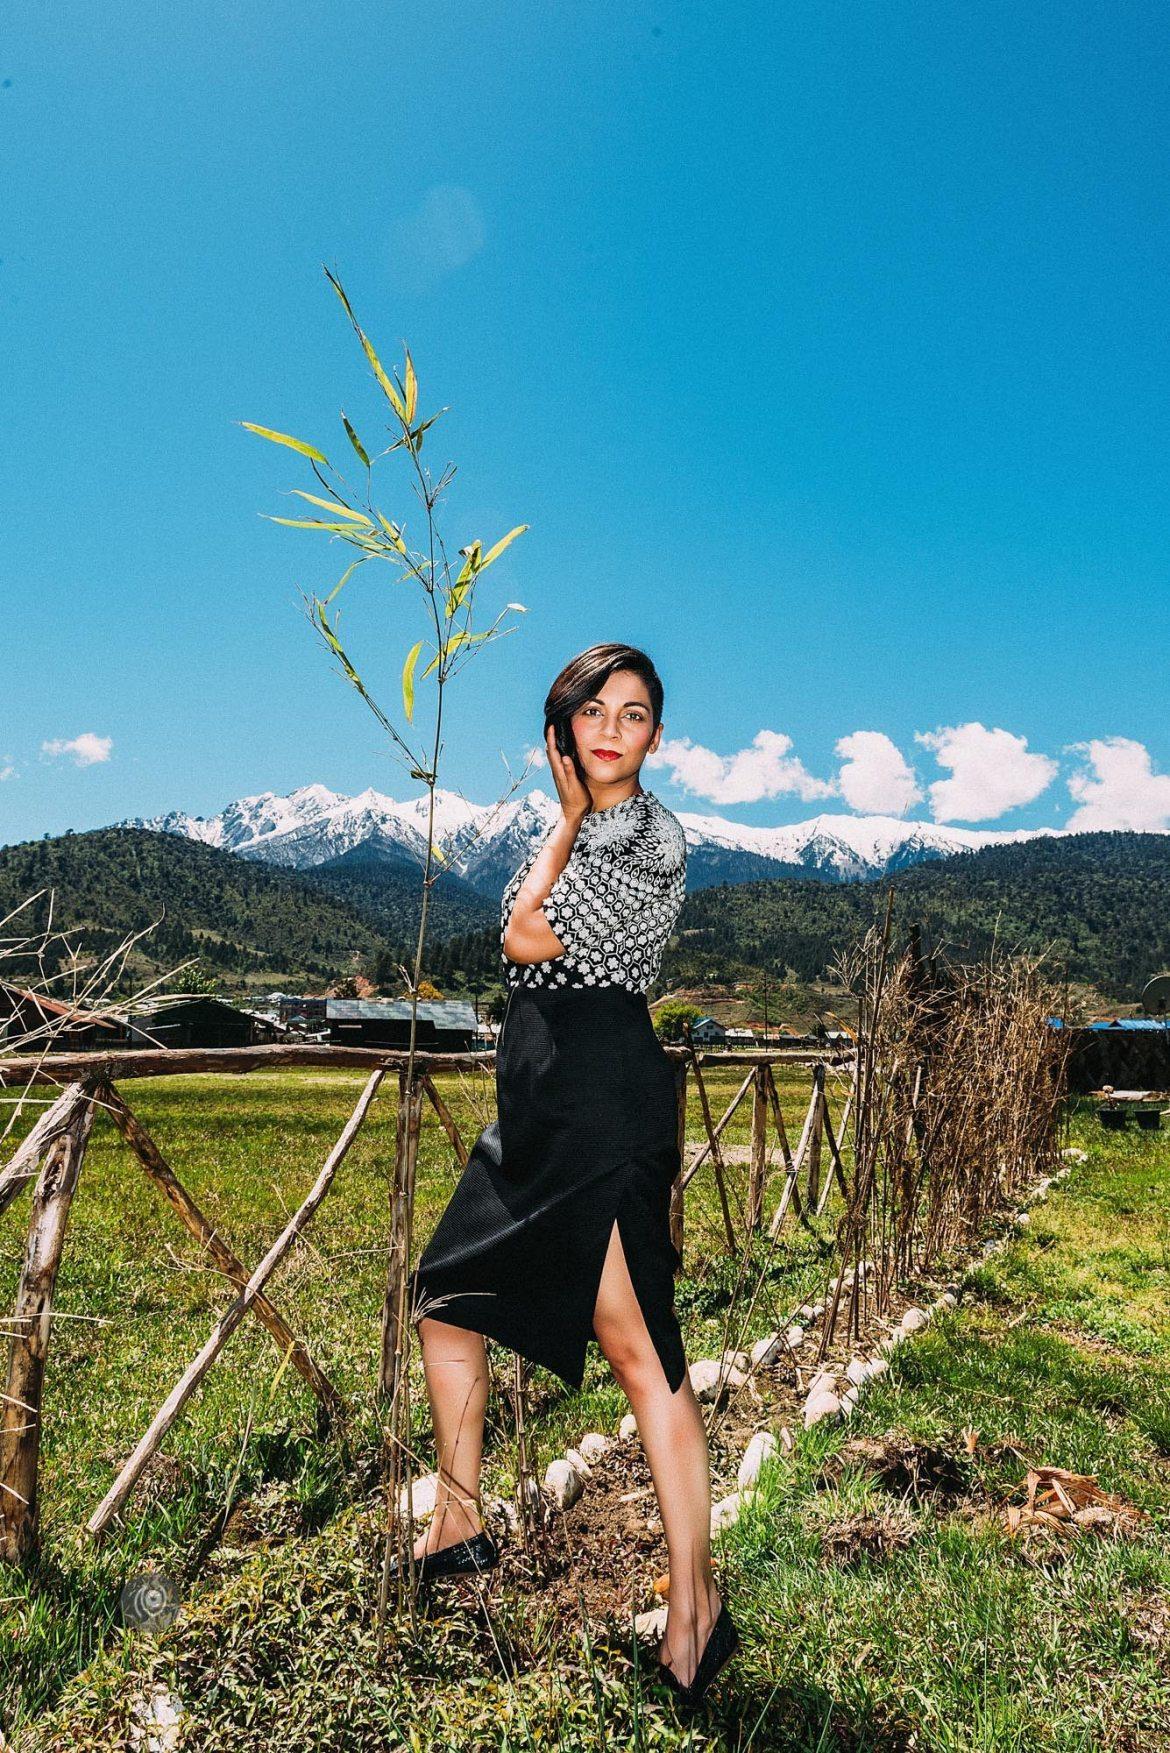 #CoverUp 76, #EyesForArunachal, Naina.co, Luxury Photographer, Lifestyle Photographer, Travel Photographer, Fashion Photographer, Naina Redhu, #EyesForDestinations, #EyesForIndia, Destination Photographer, India, Arunachal Pradesh, Menchukha, Experience Collector, Photo Story, Visual Experience Collector, #CoverUp, Rahul Mishra, Dress, Embroidery, Embroidered